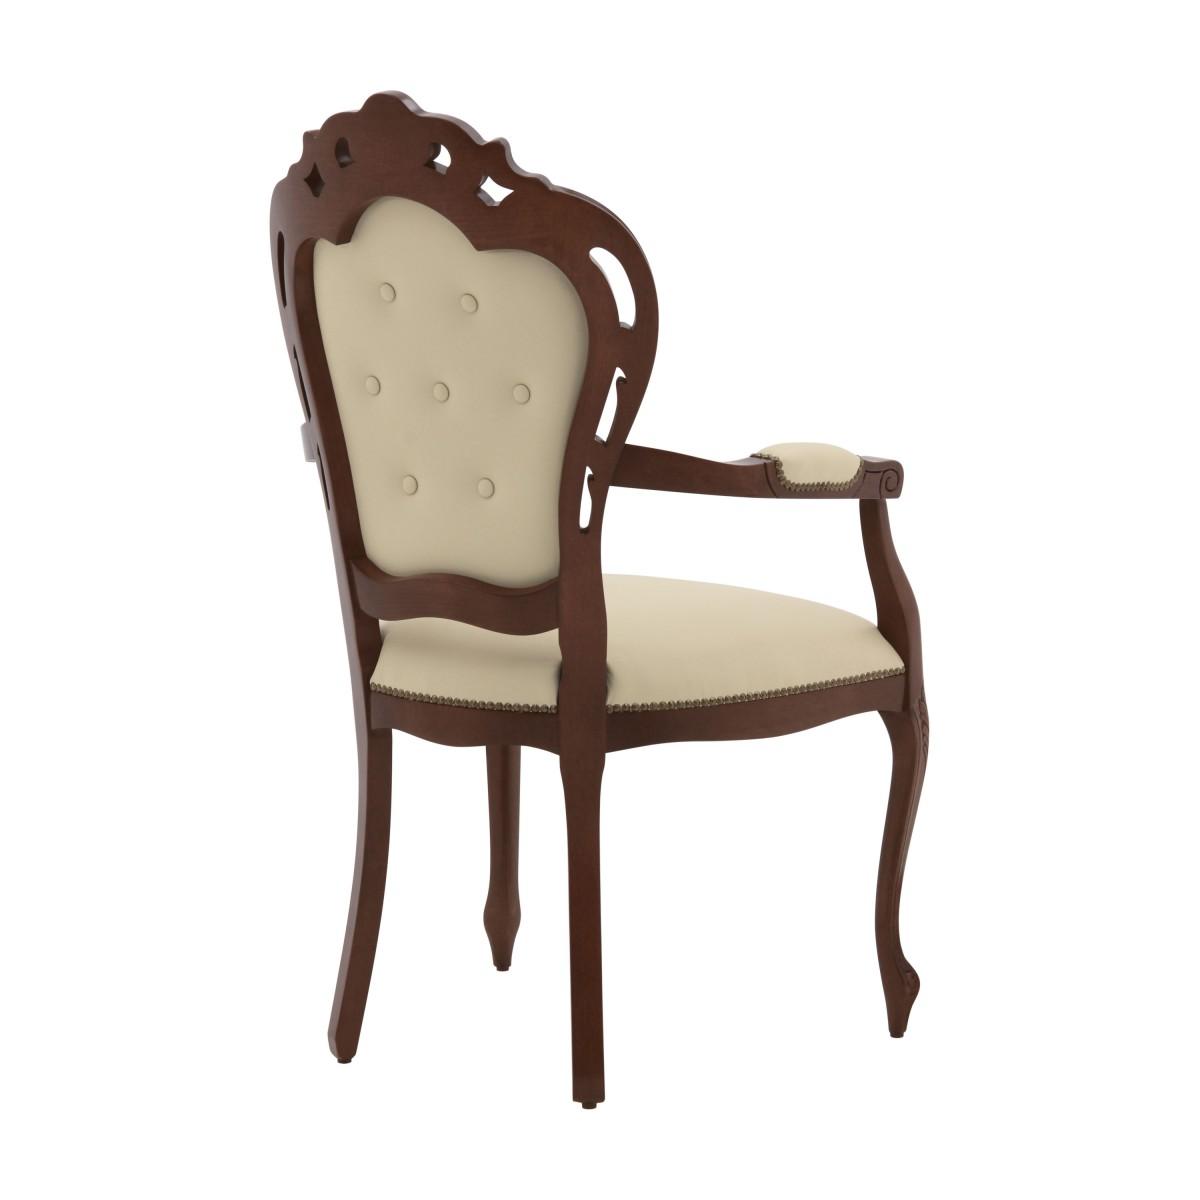 Small armchair Traforata - Sevensedie